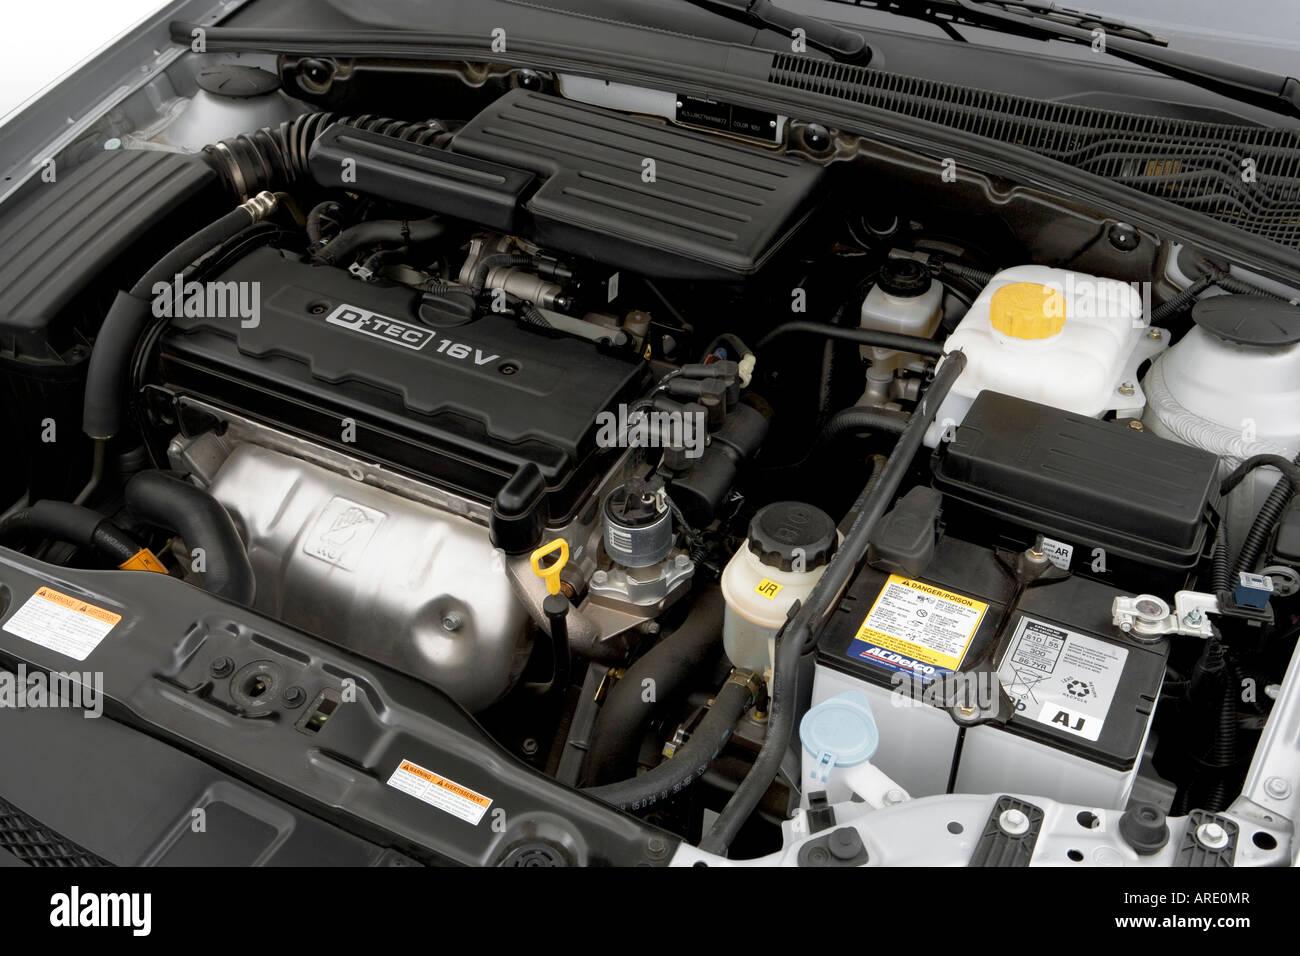 Suzuki forenza 2006 motor